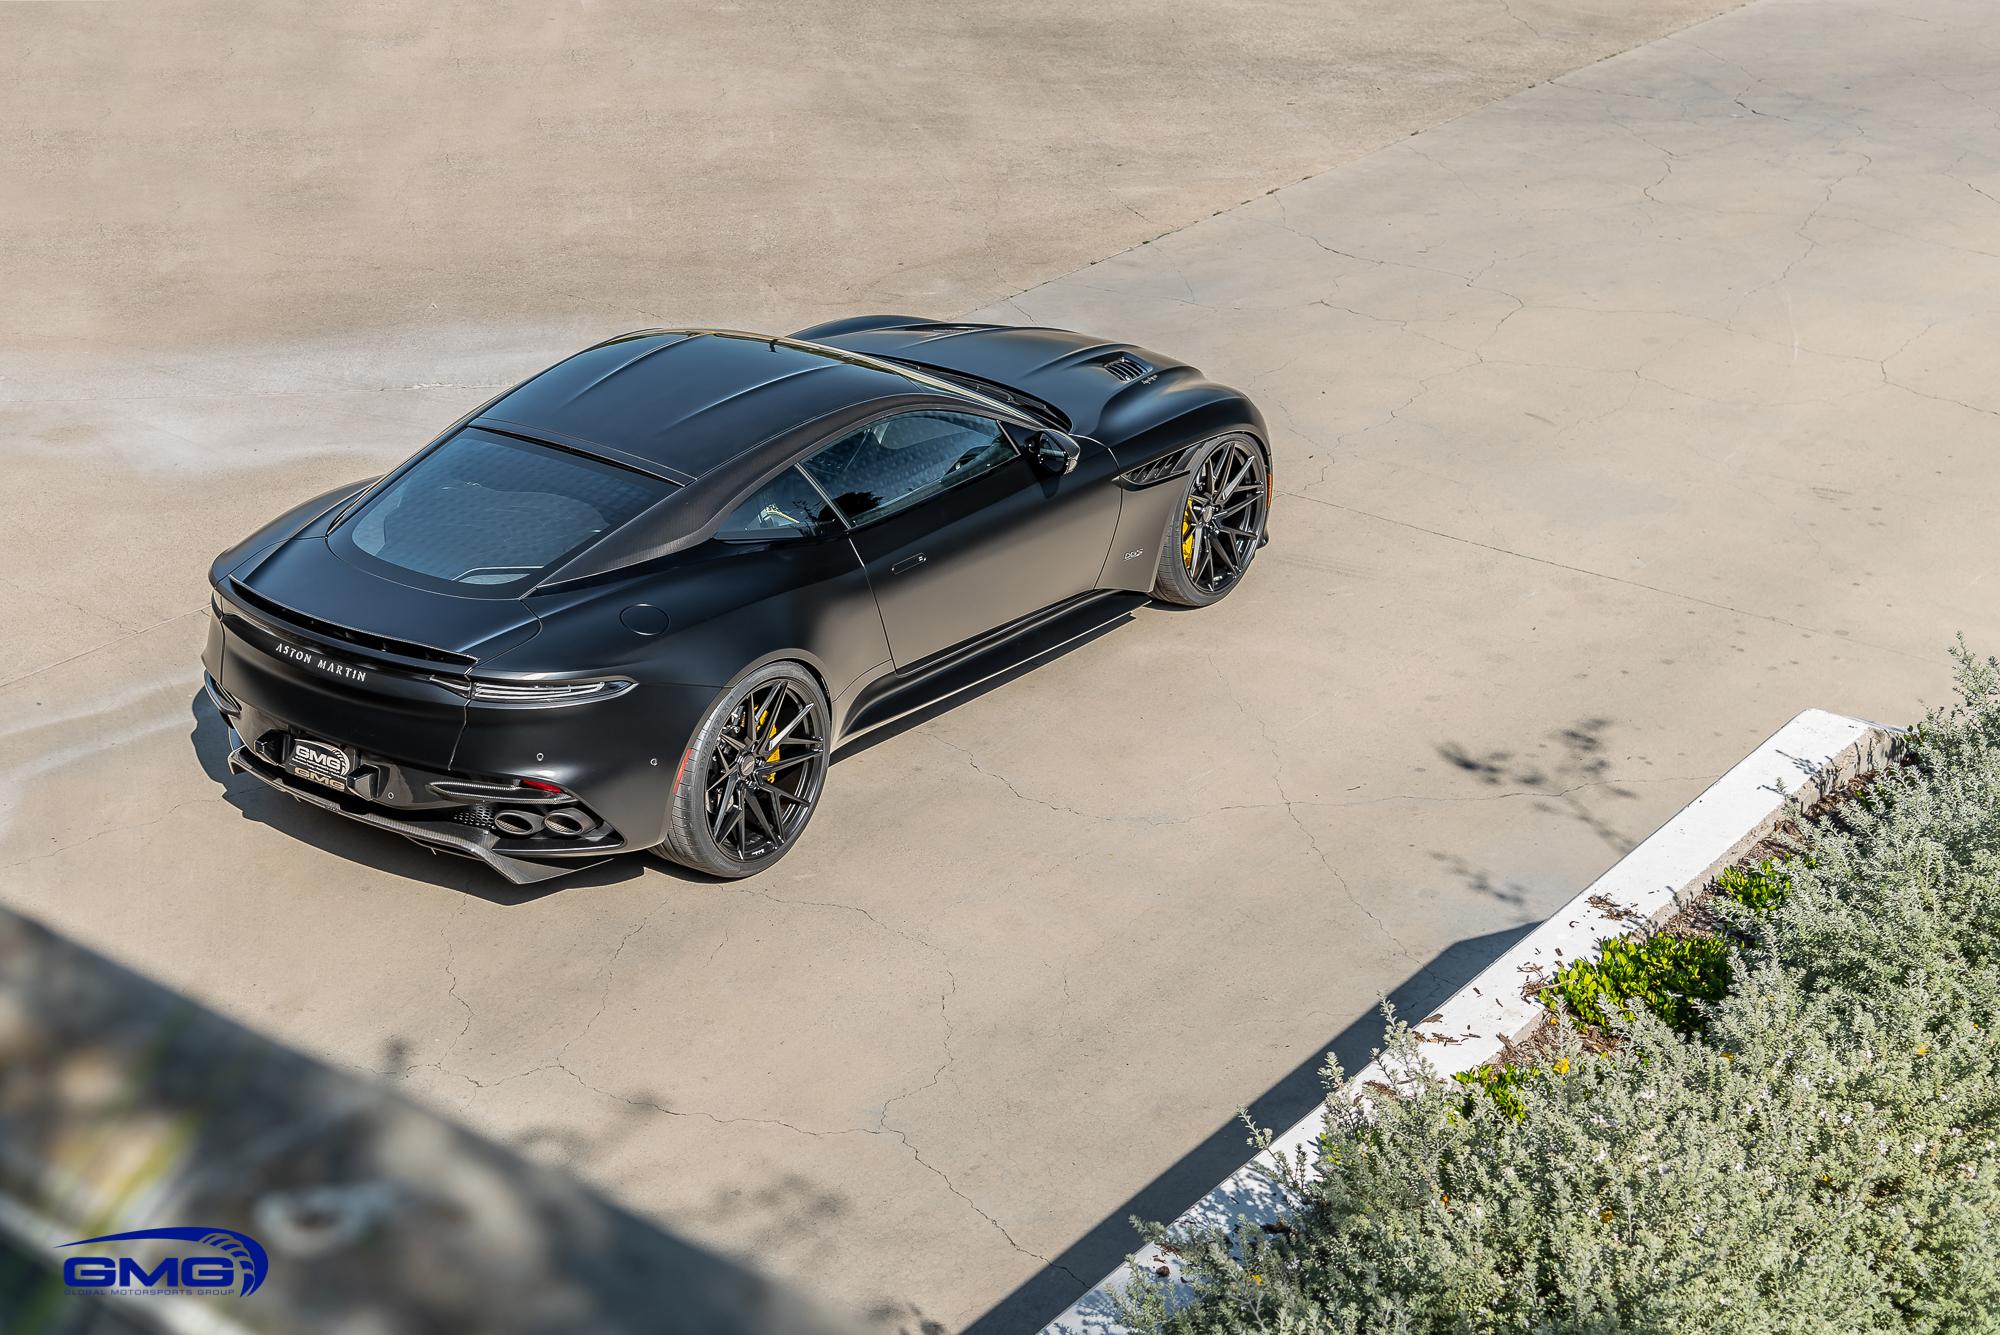 Matte Black Aston Martin DBS Superleggera